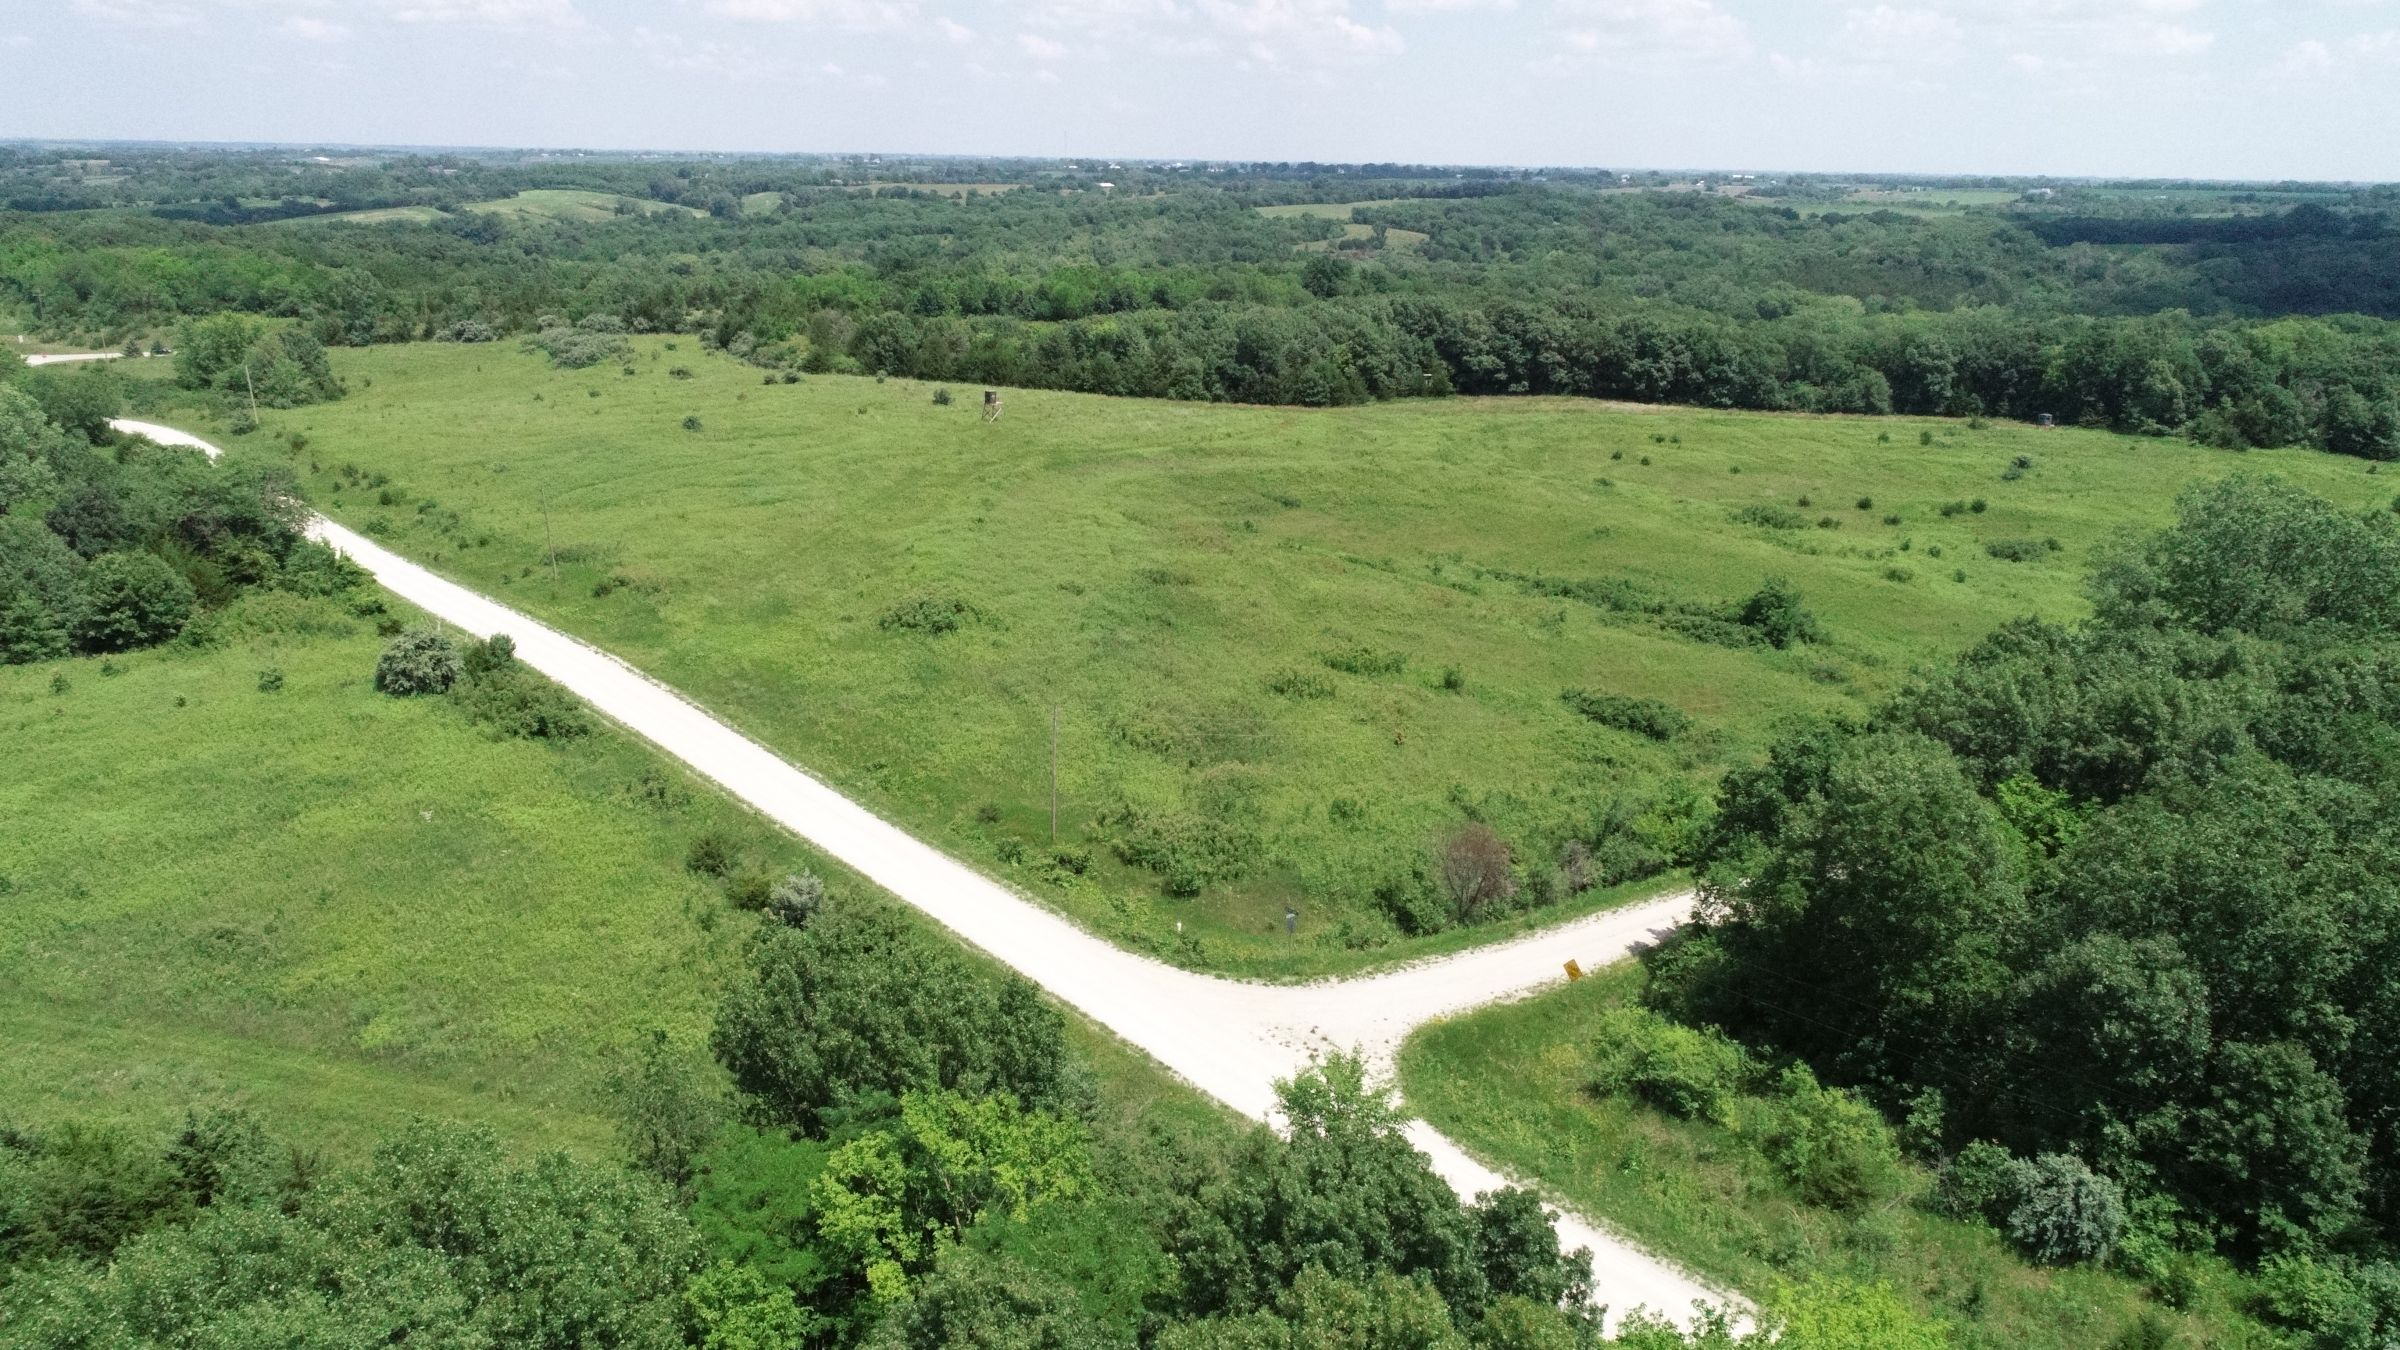 land-warren-county-iowa-29-acres-listing-number-15622-6-2021-07-02-190412.JPG